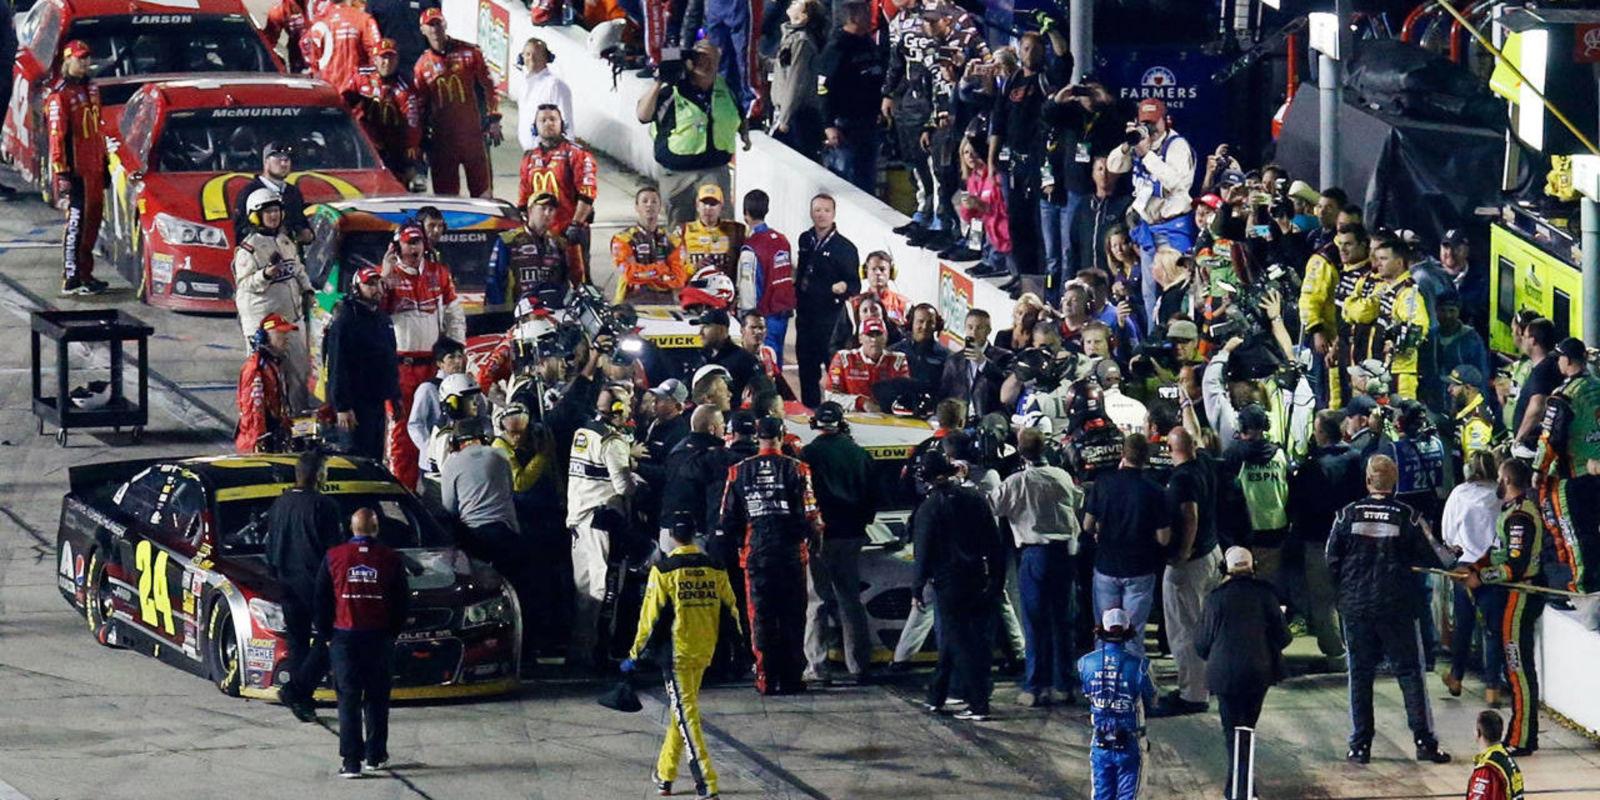 After Gordon and Keselowski brawl pit crews pay the price